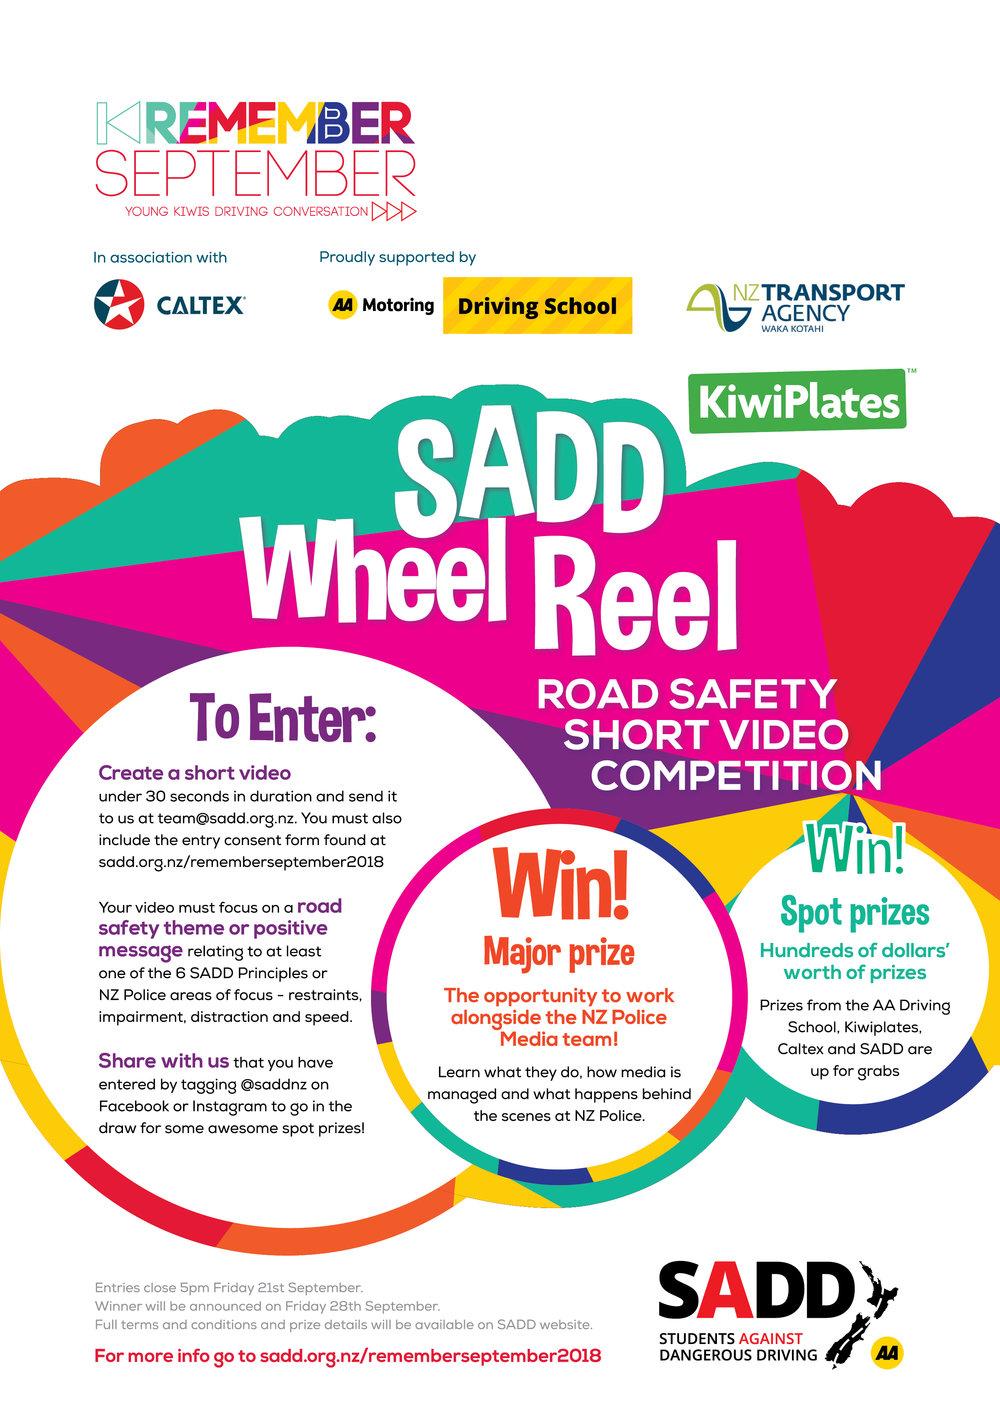 SADD-RemSem-Wheel Reel poster-2.0.jpg